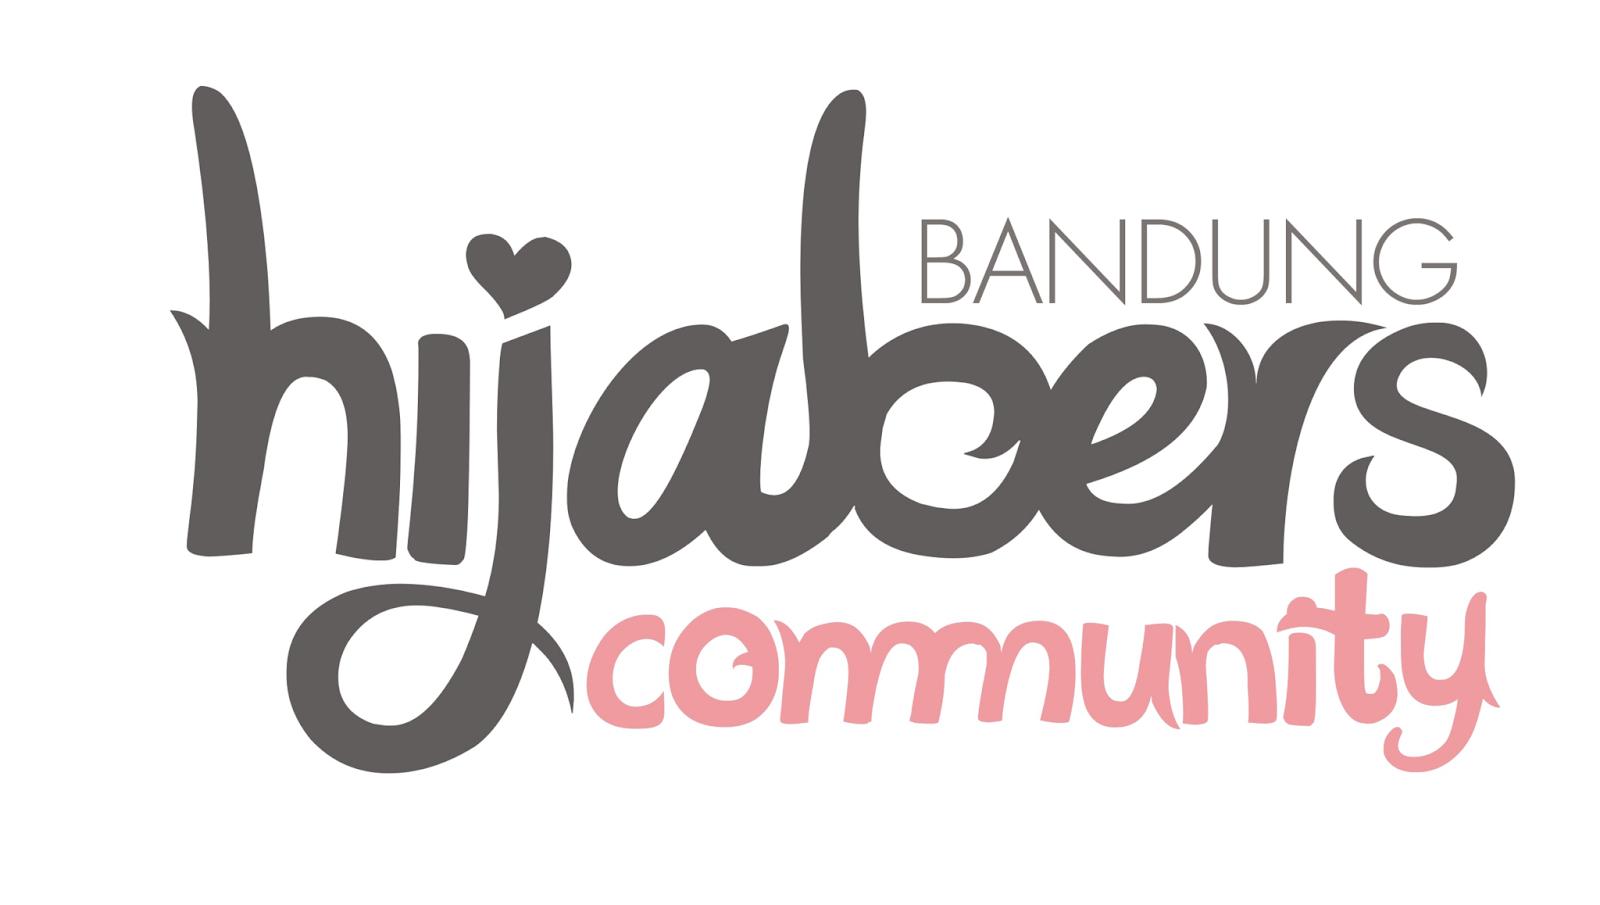 Hijabers Community Bandung